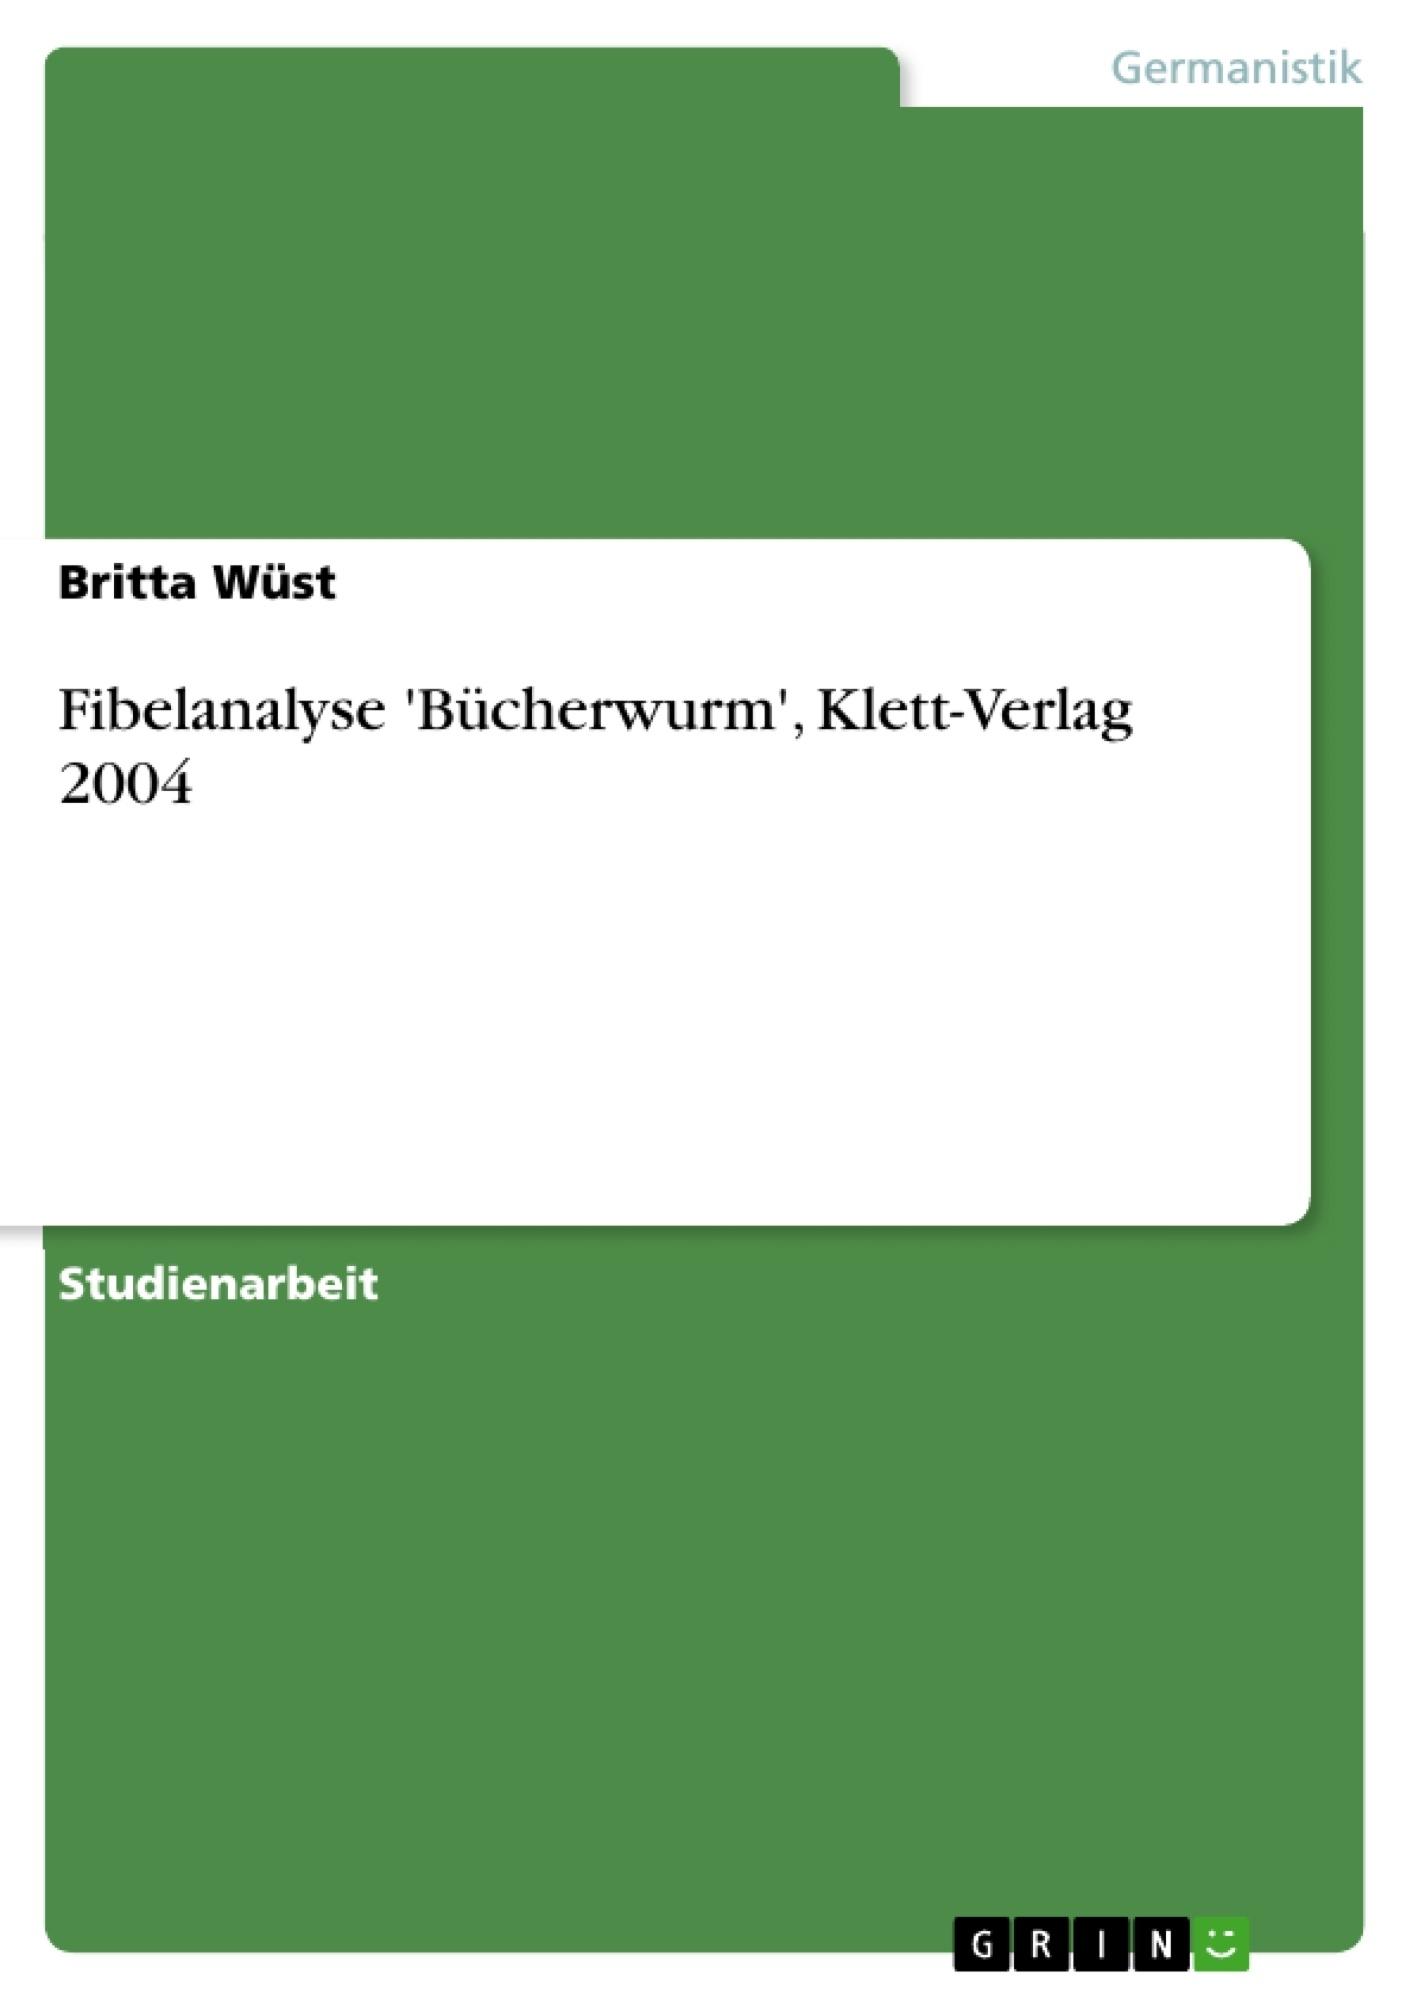 Titel: Fibelanalyse 'Bücherwurm', Klett-Verlag 2004